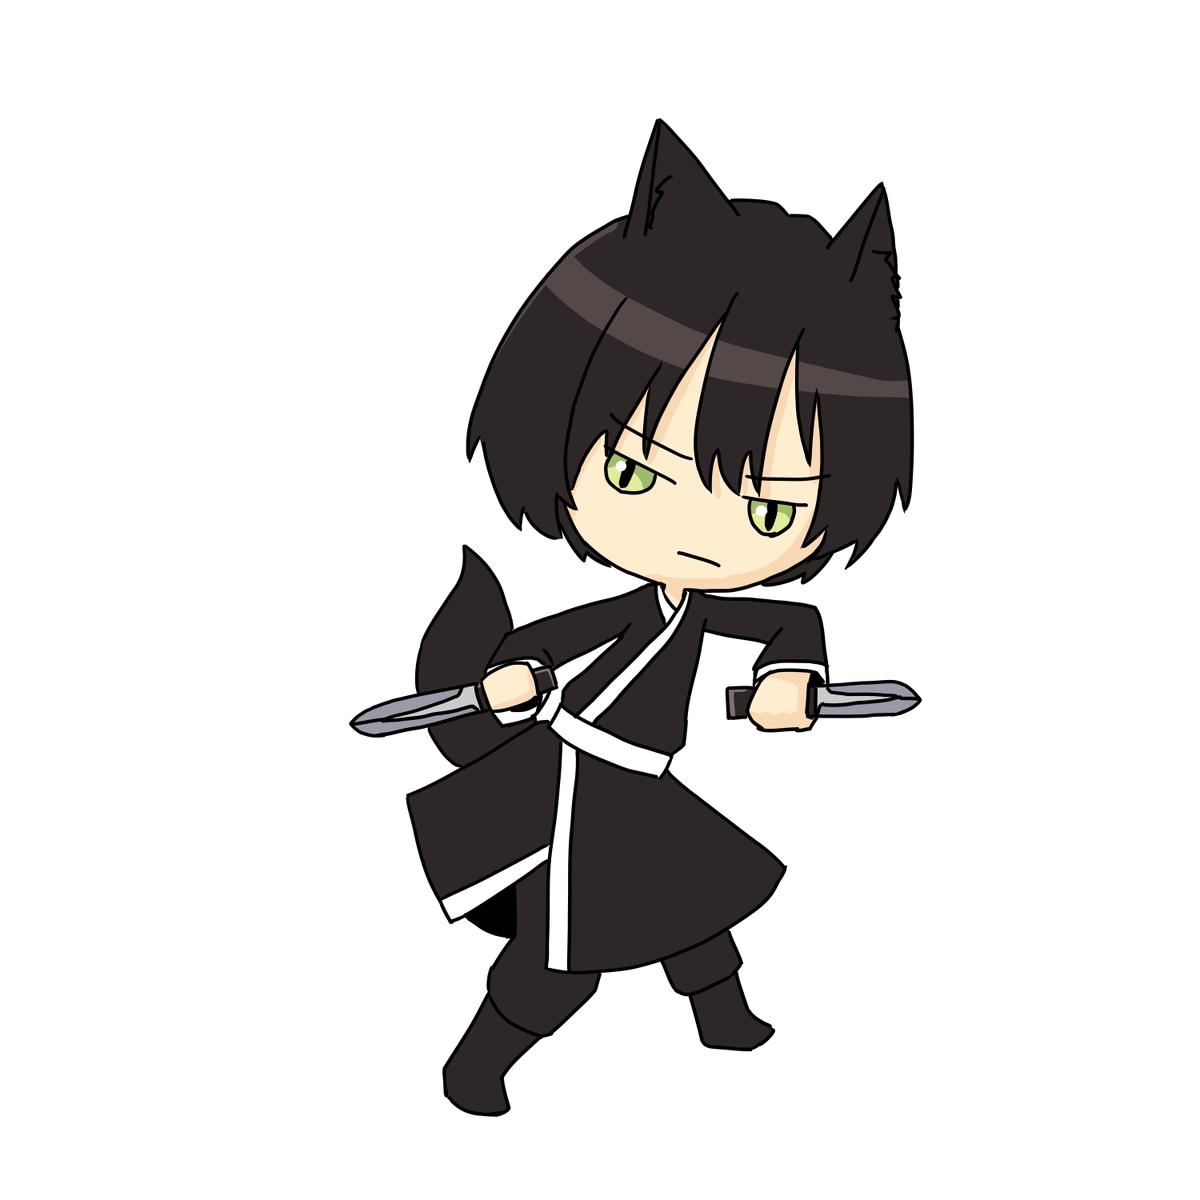 f:id:ayano-magic:20200731072225p:plain